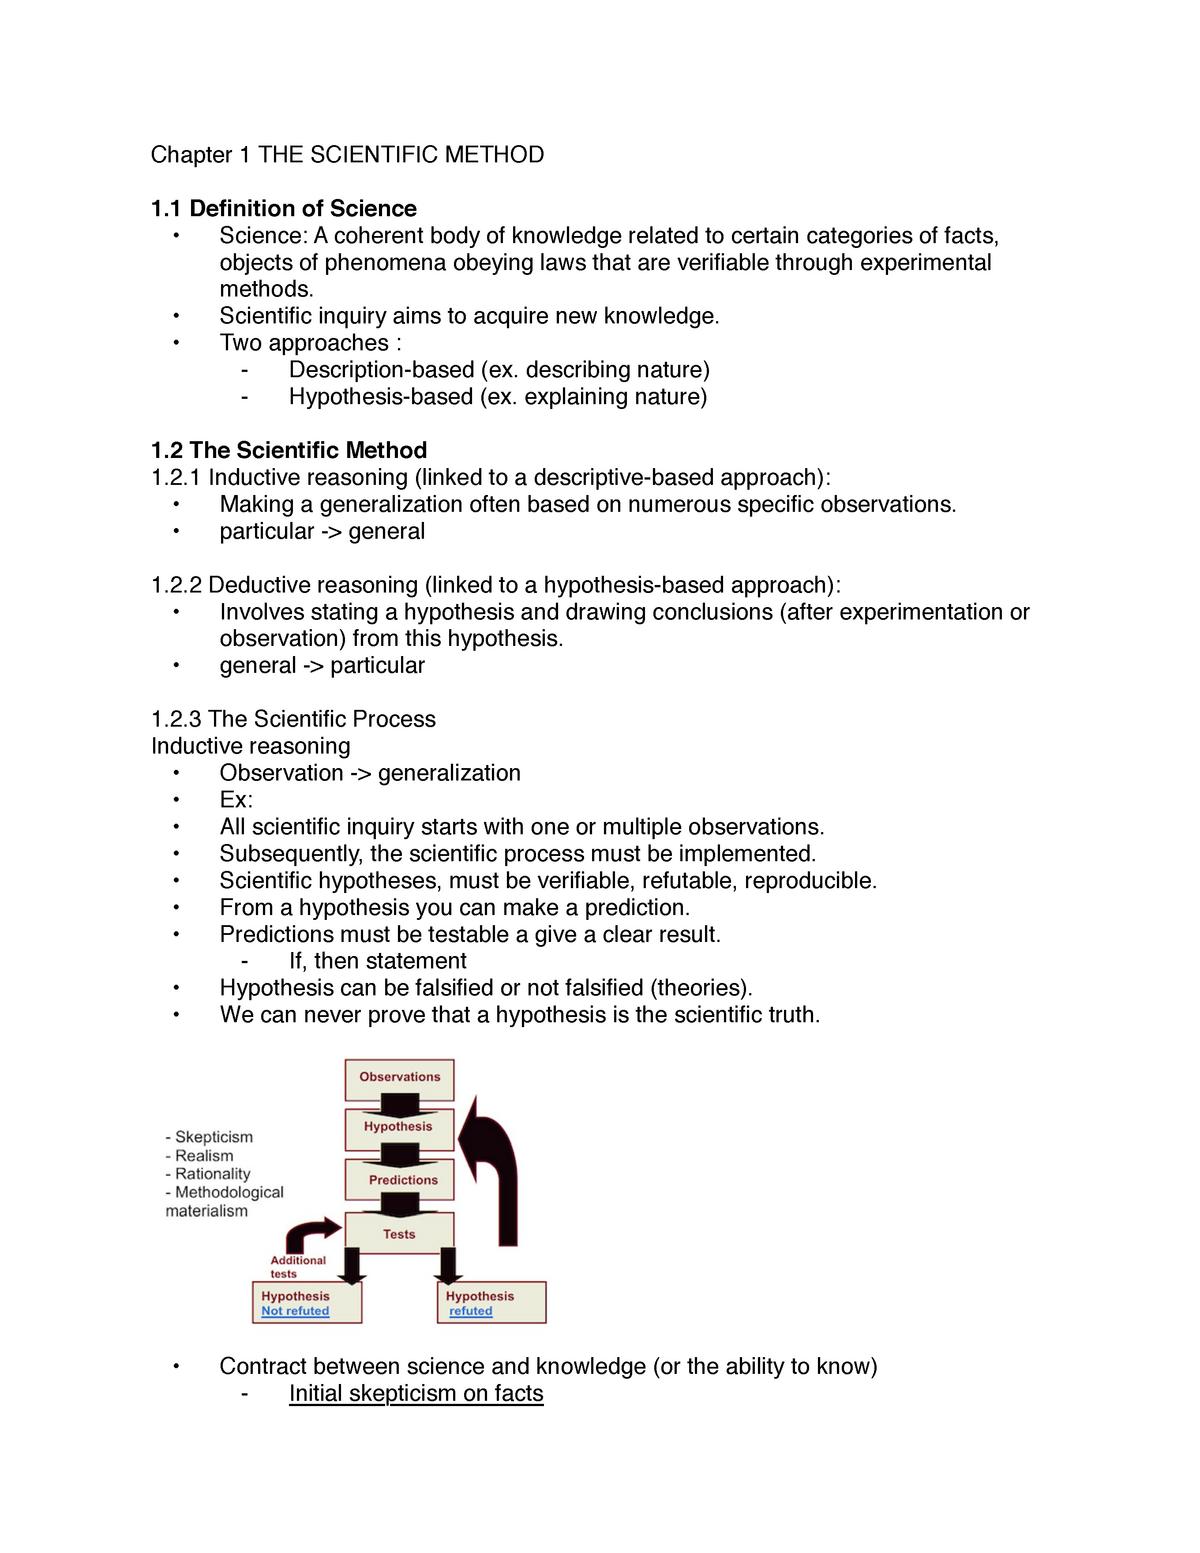 Chapter 1 THE Scientific Method - BIO1130 - uOttawa - StuDocu